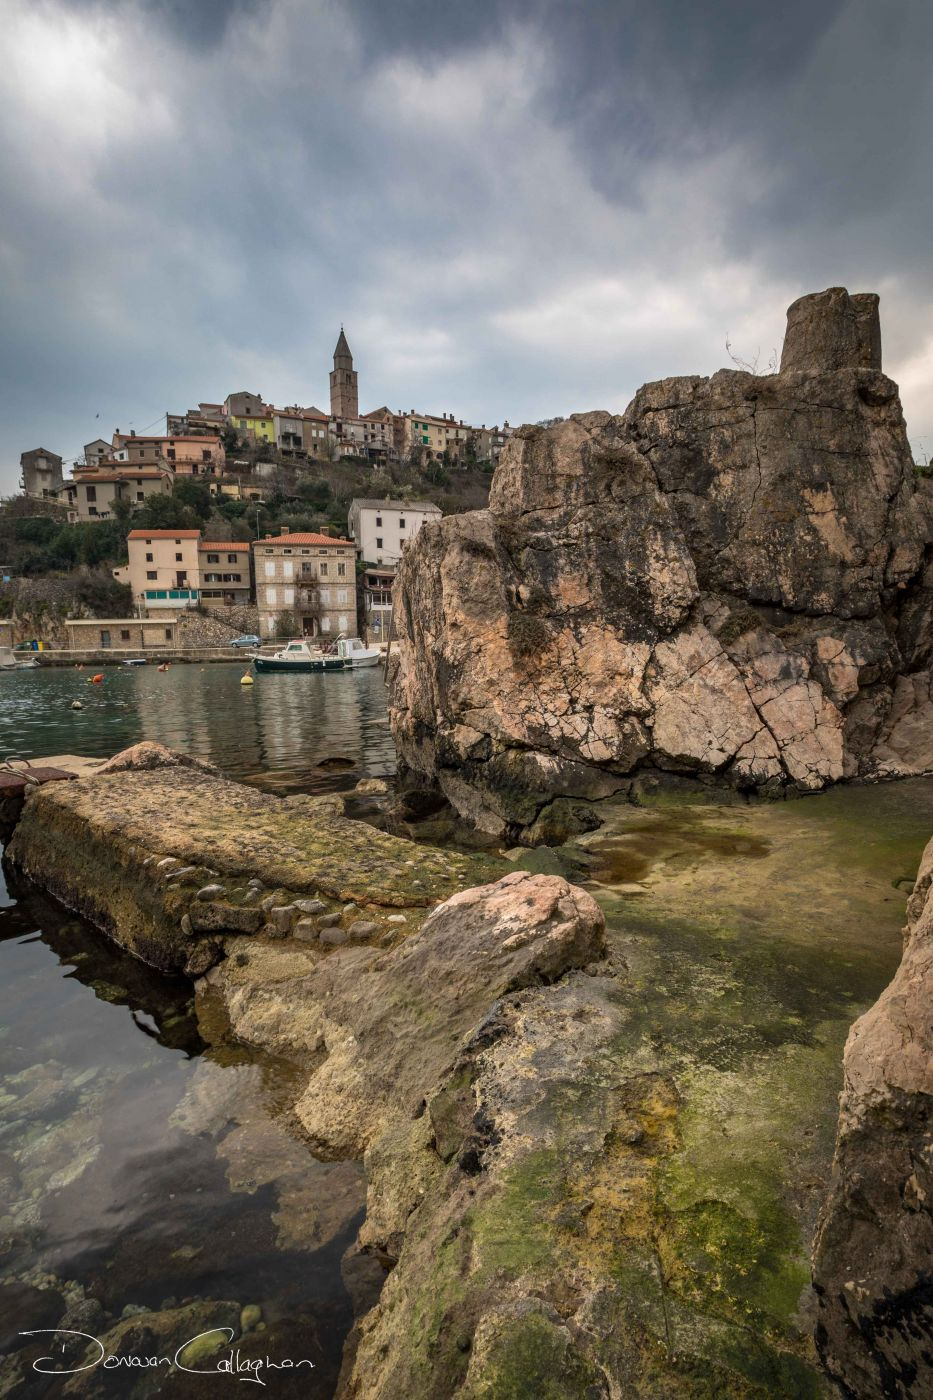 Vrbnk Harbour and town, Croatia